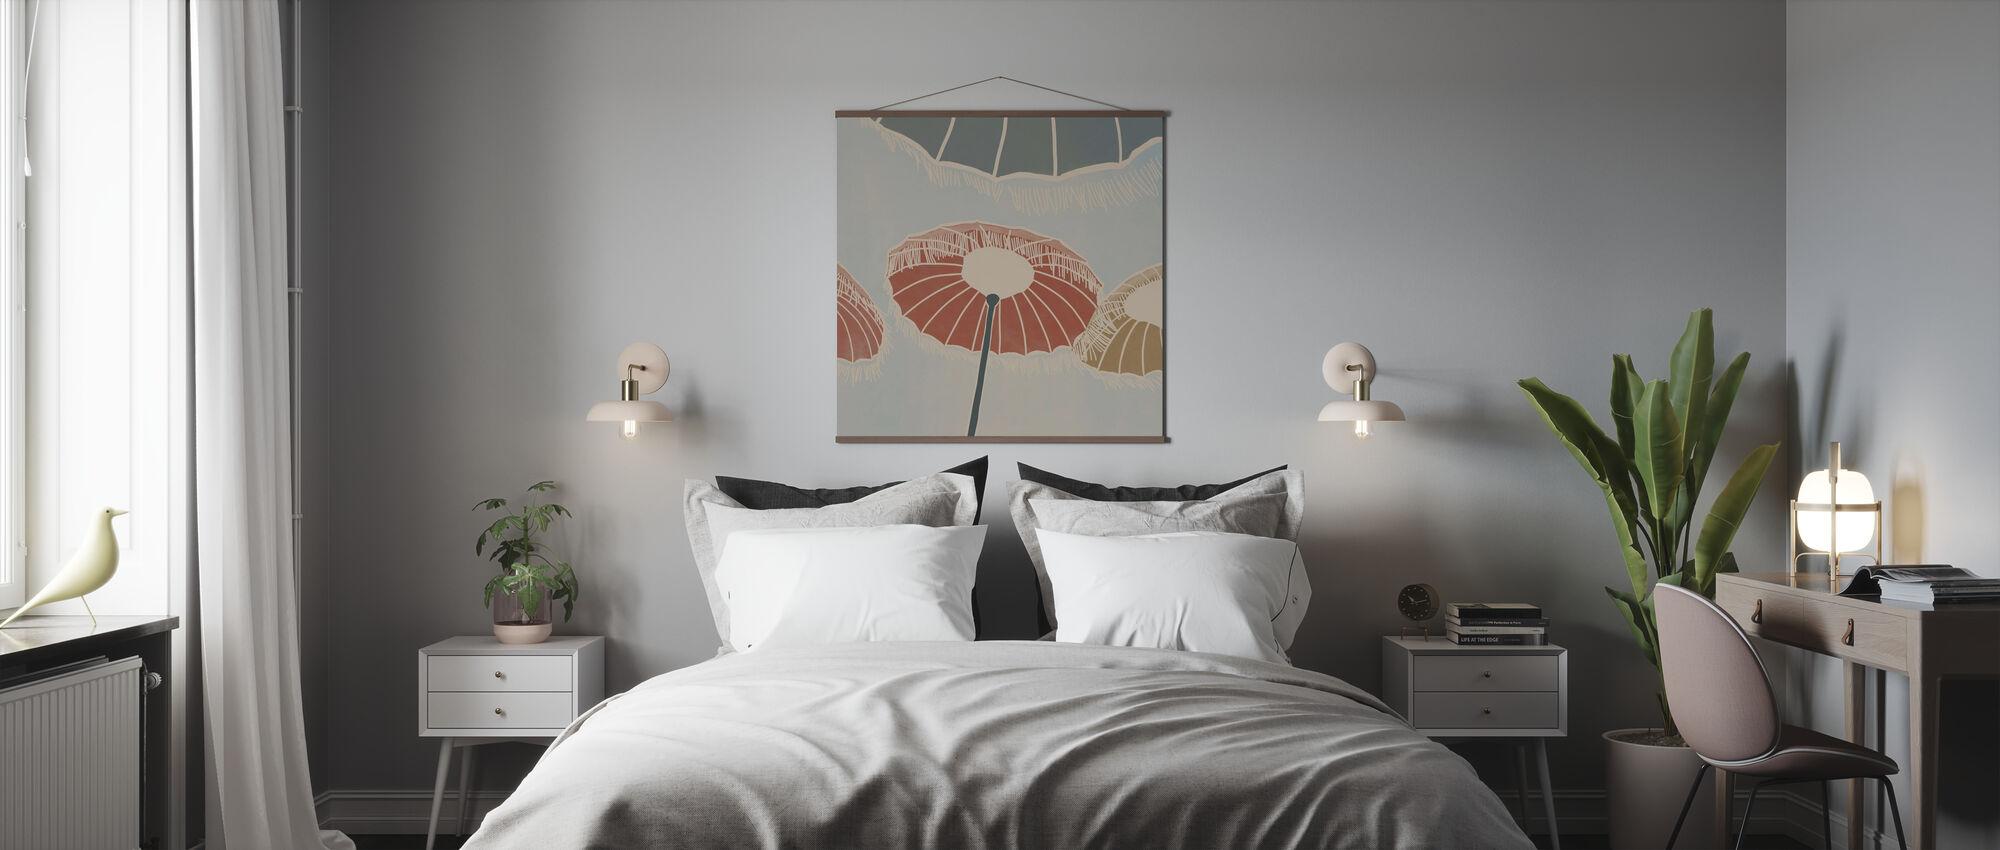 On the Beach - Umbrellas - Poster - Bedroom